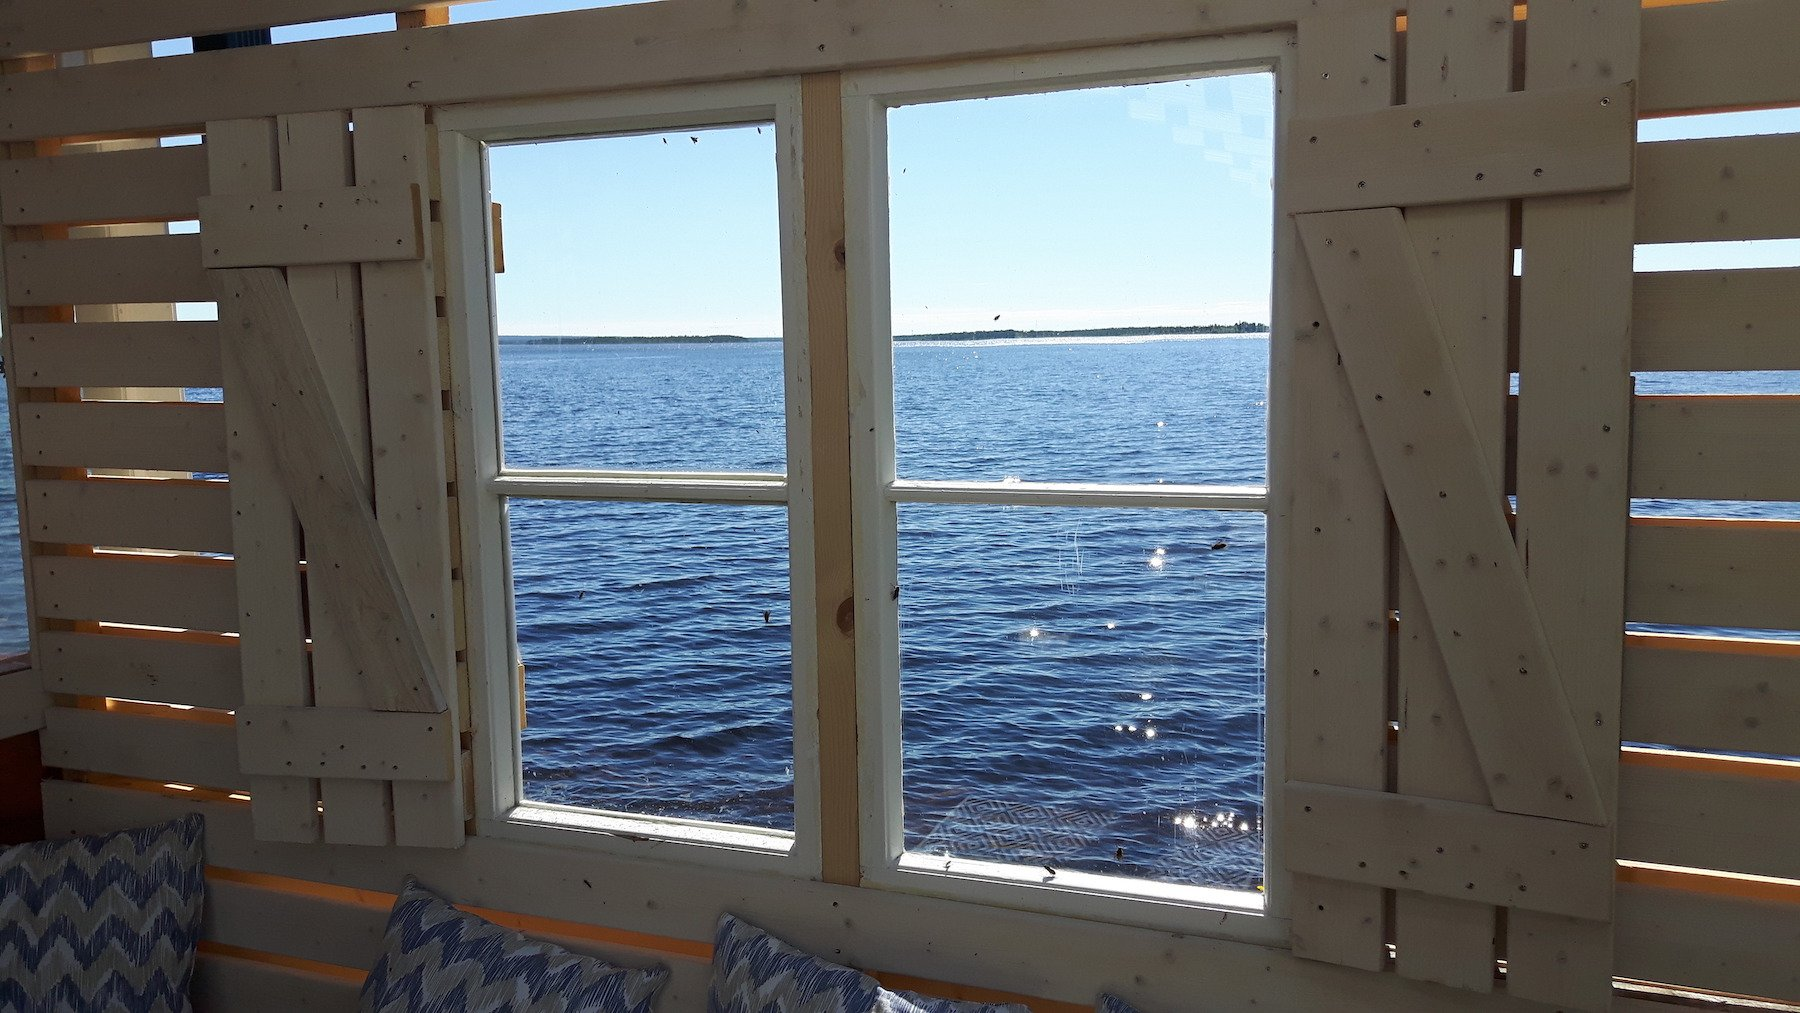 Window in Cafe Harianna Vajunen Finland